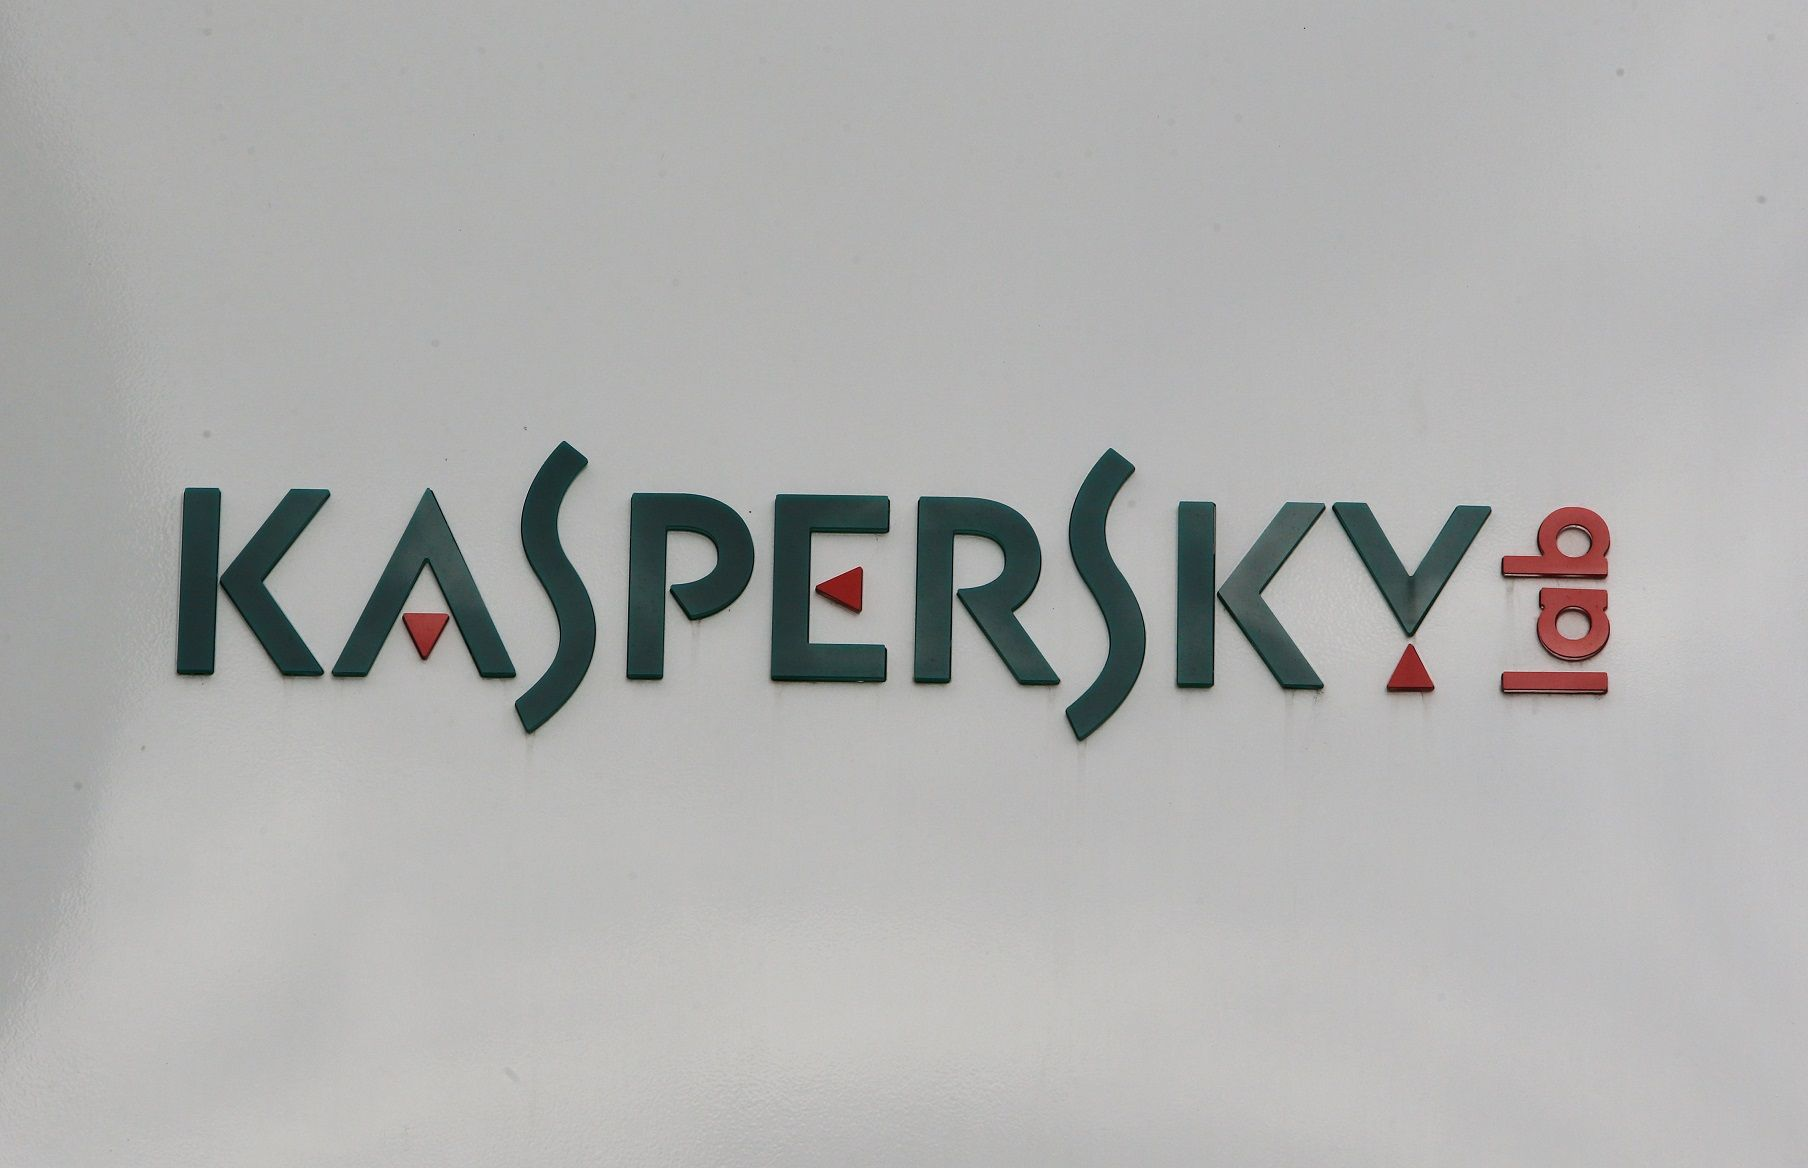 how russian hackers kaspersky antivirus spy